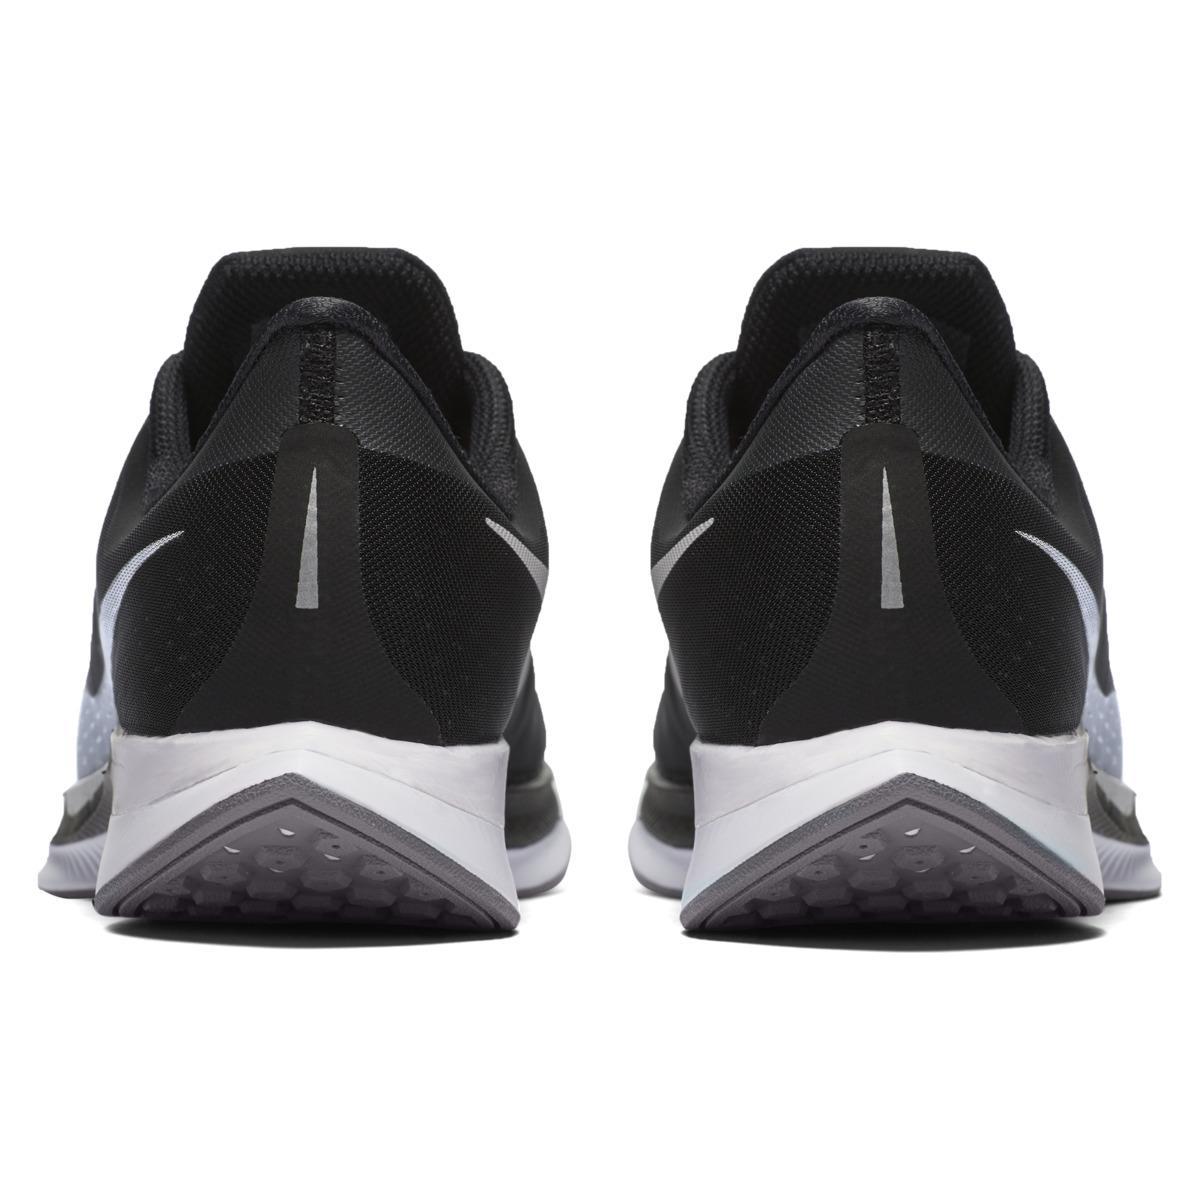 ac52abcff Nike - Black Zoom Pegasus Turbo Running Shoes - Lyst. View fullscreen